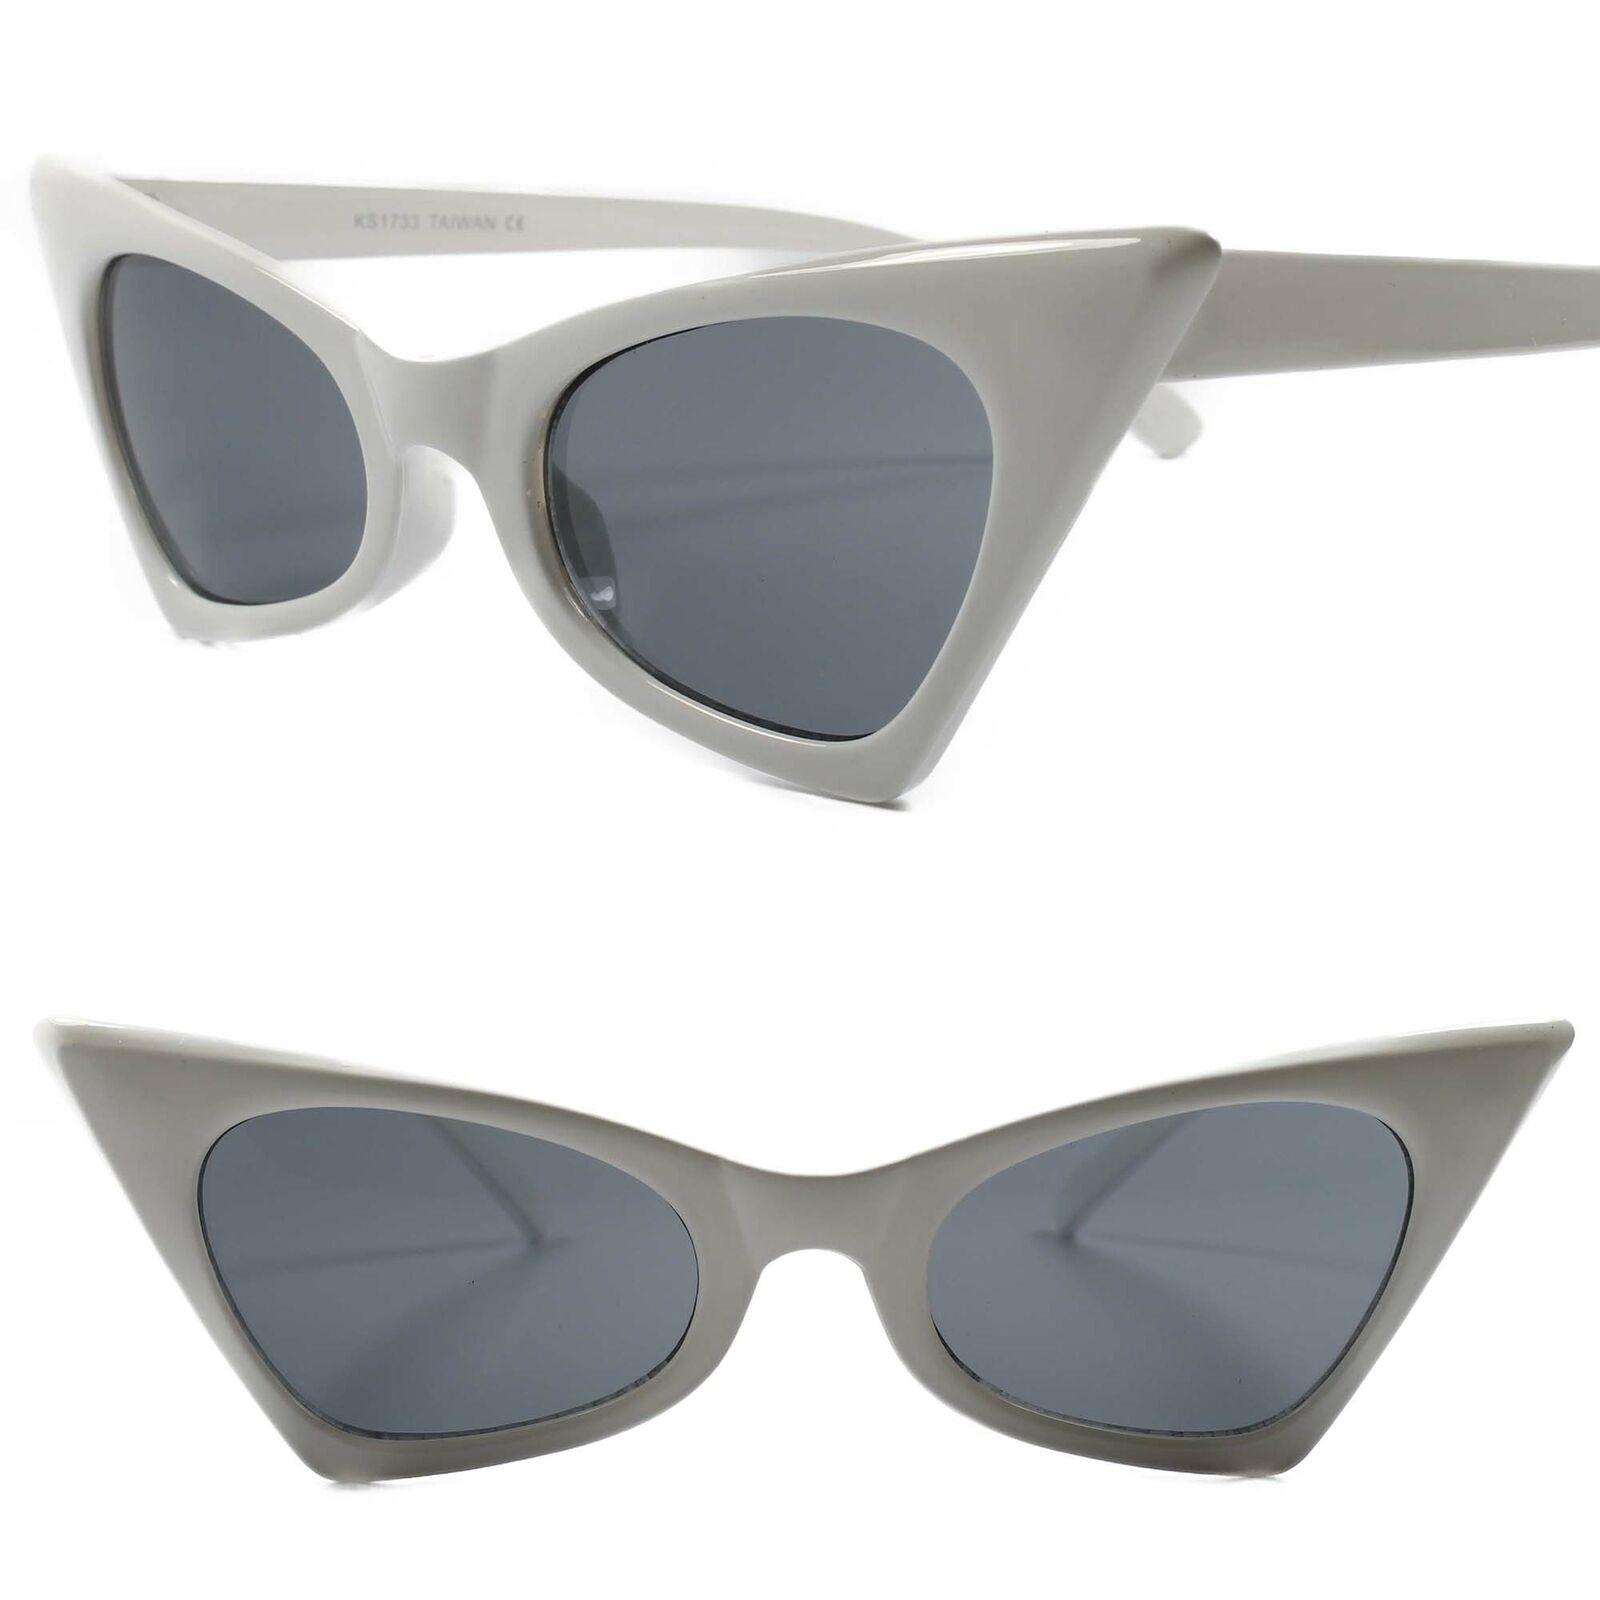 Classic Vintage Retro 90s Look Chic Sexy Foxy Womens White Cat Eye Sunglasses